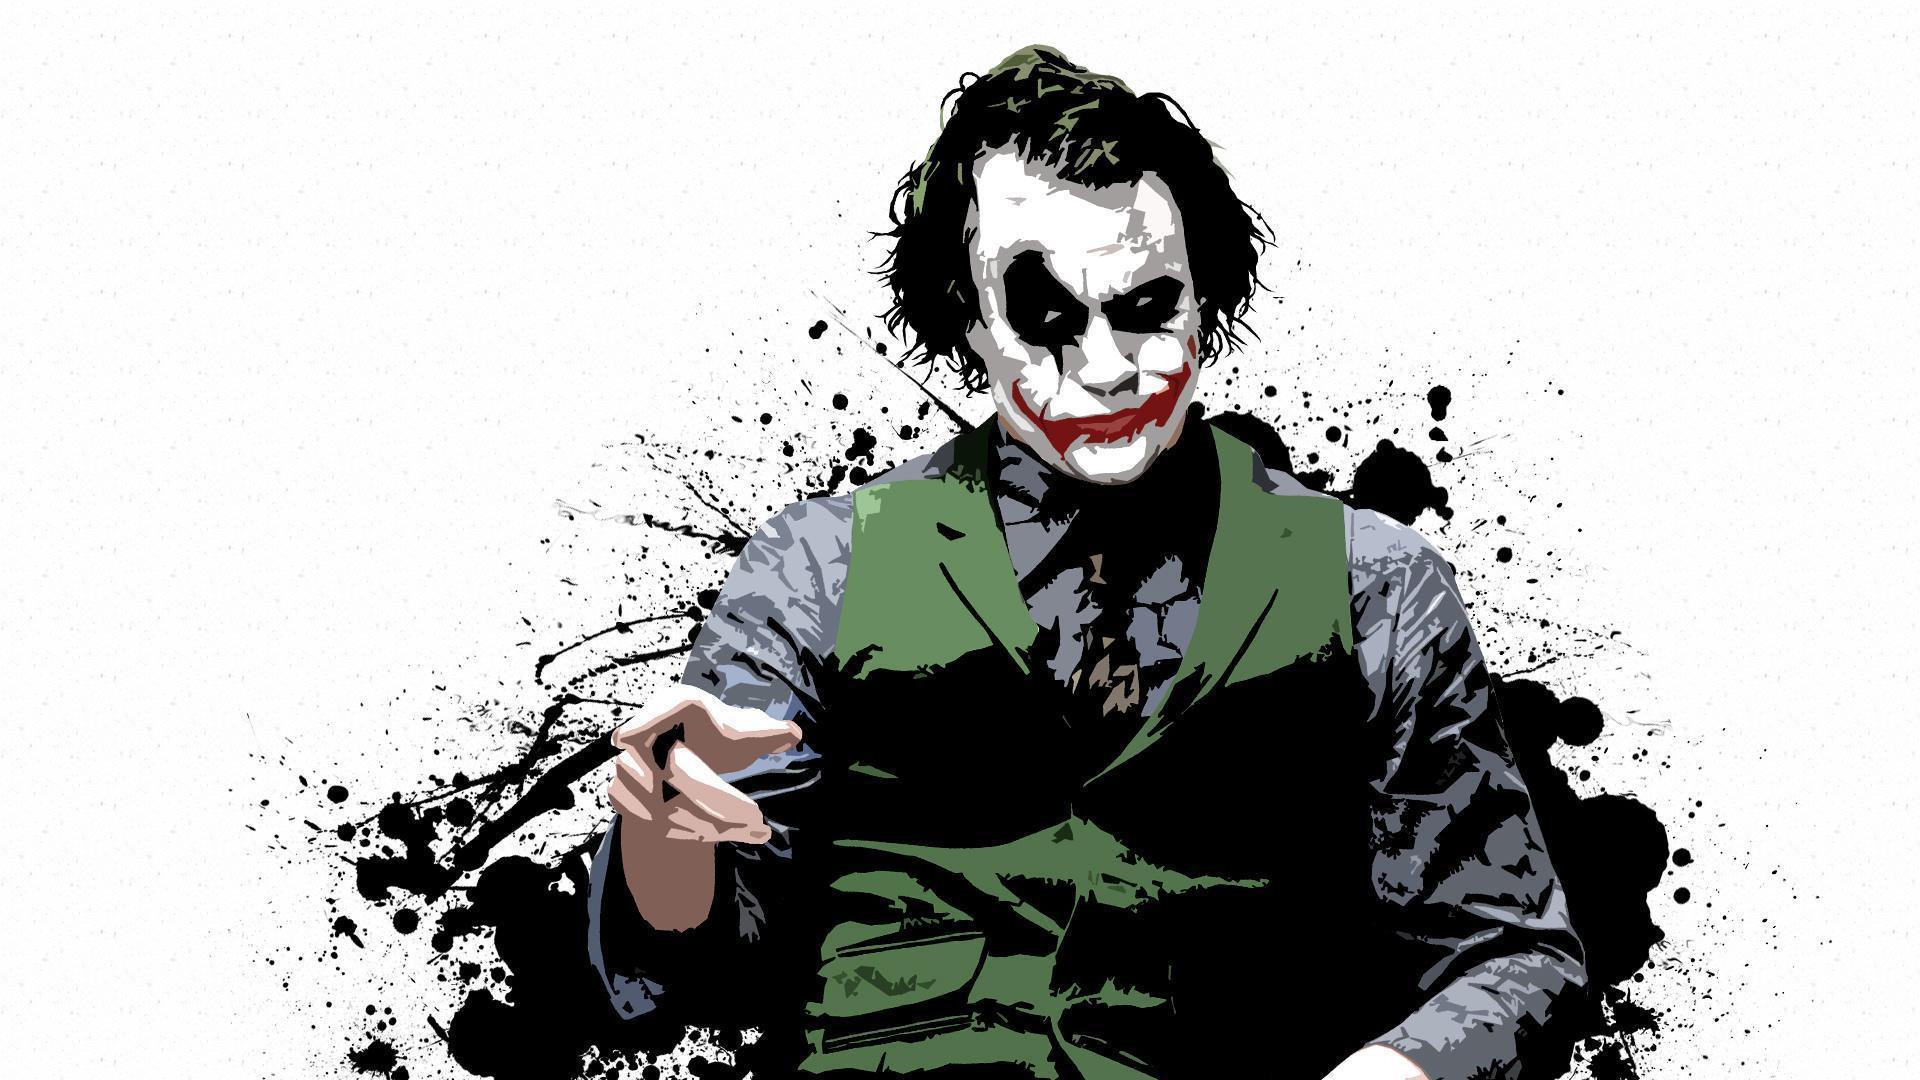 Batman Joker Hd Wallpapers 1080p Wallpaper Cave